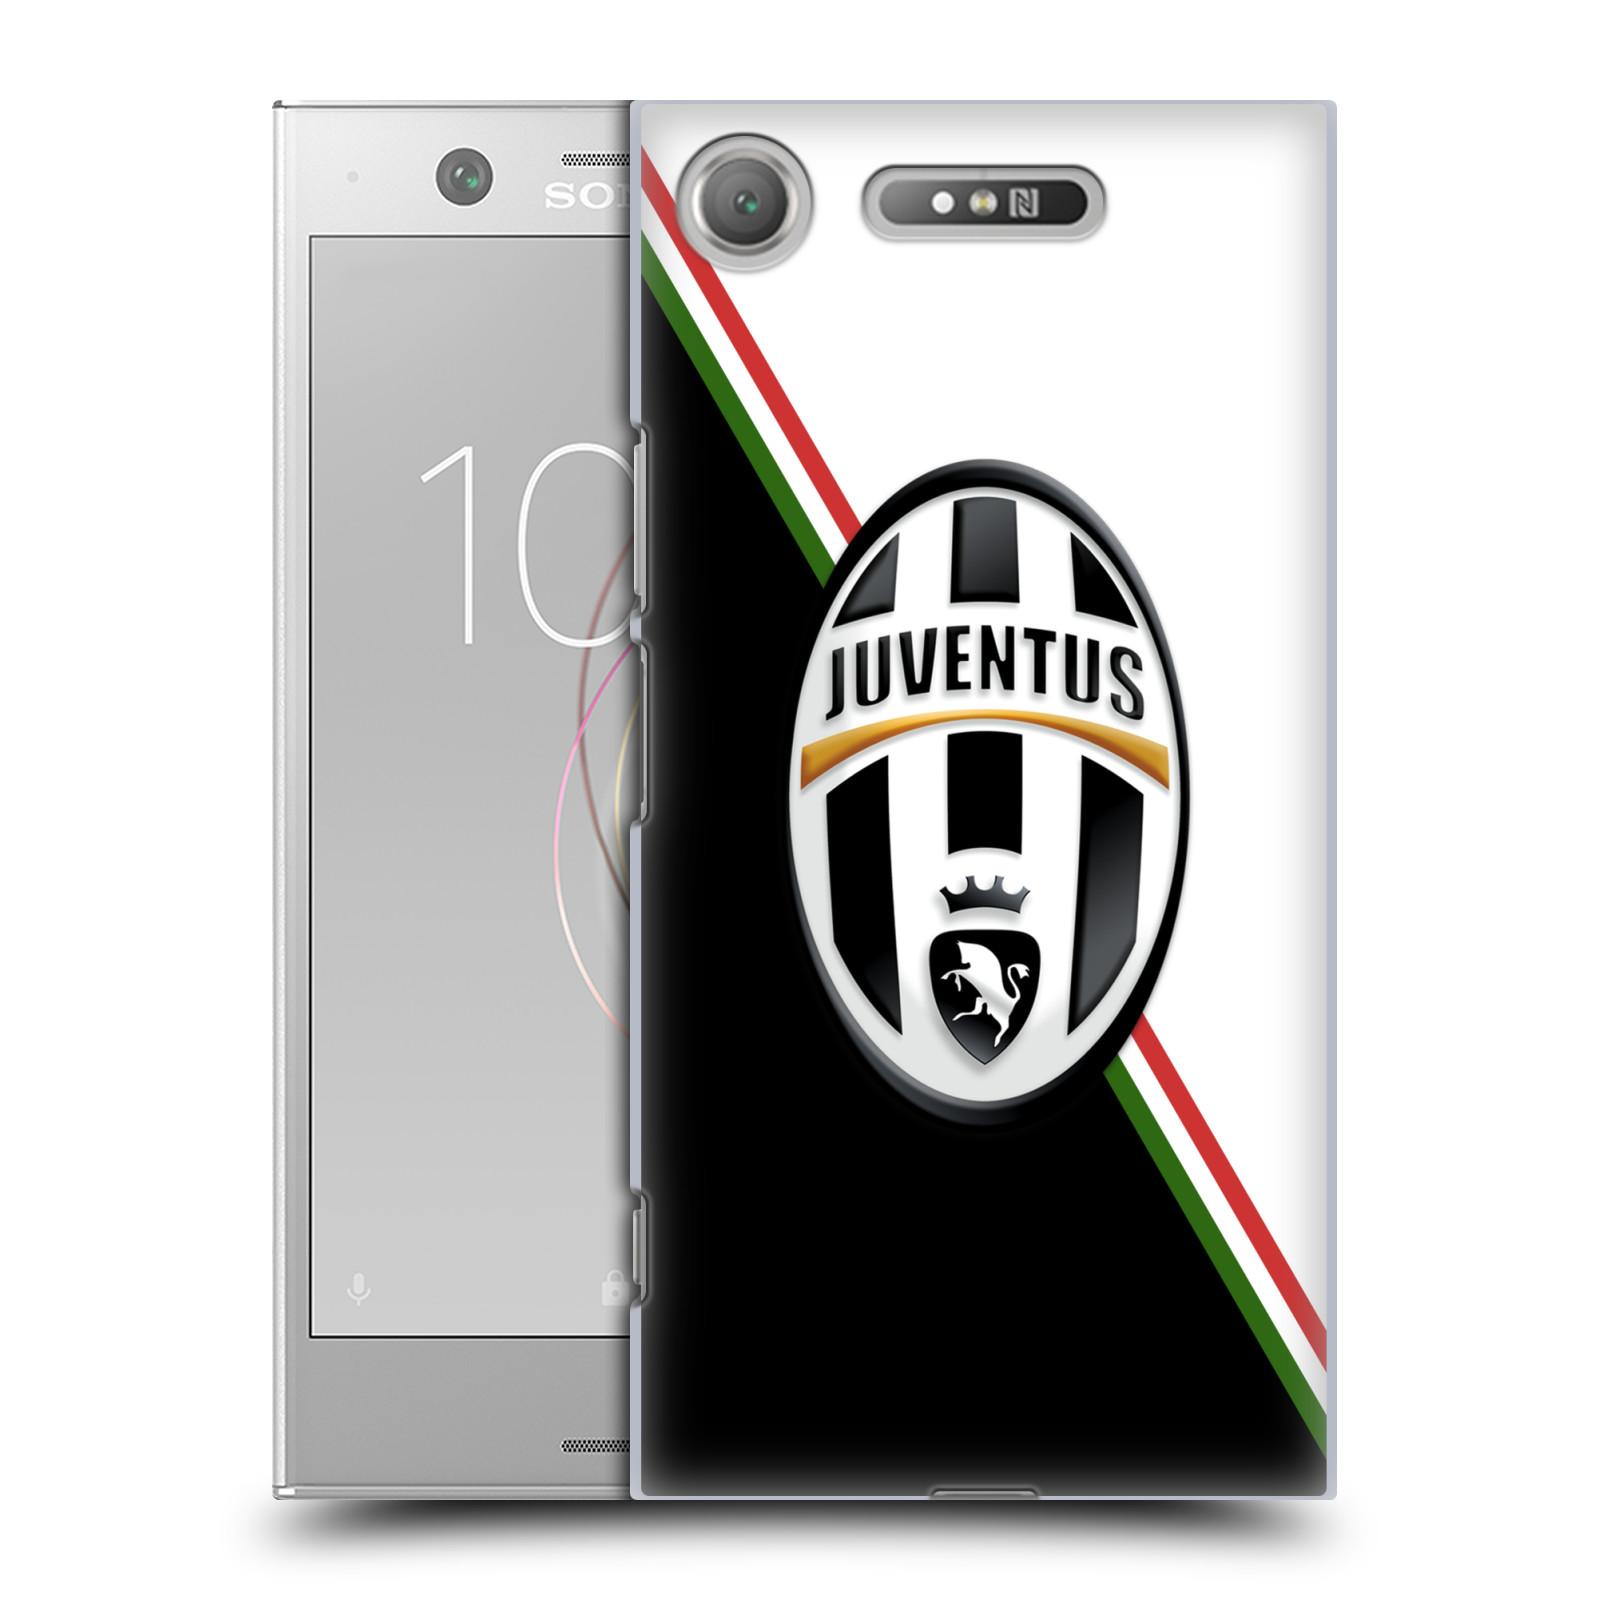 Plastové pouzdro na mobil Sony Xperia XZ1 - Head Case - Juventus FC - Black and White (Plastový kryt či obal na mobilní telefon Sony Xperia XZ1 (G8342 Dual Sim / G8341 Single Sim) s motivem Juventus FC - Black and White)